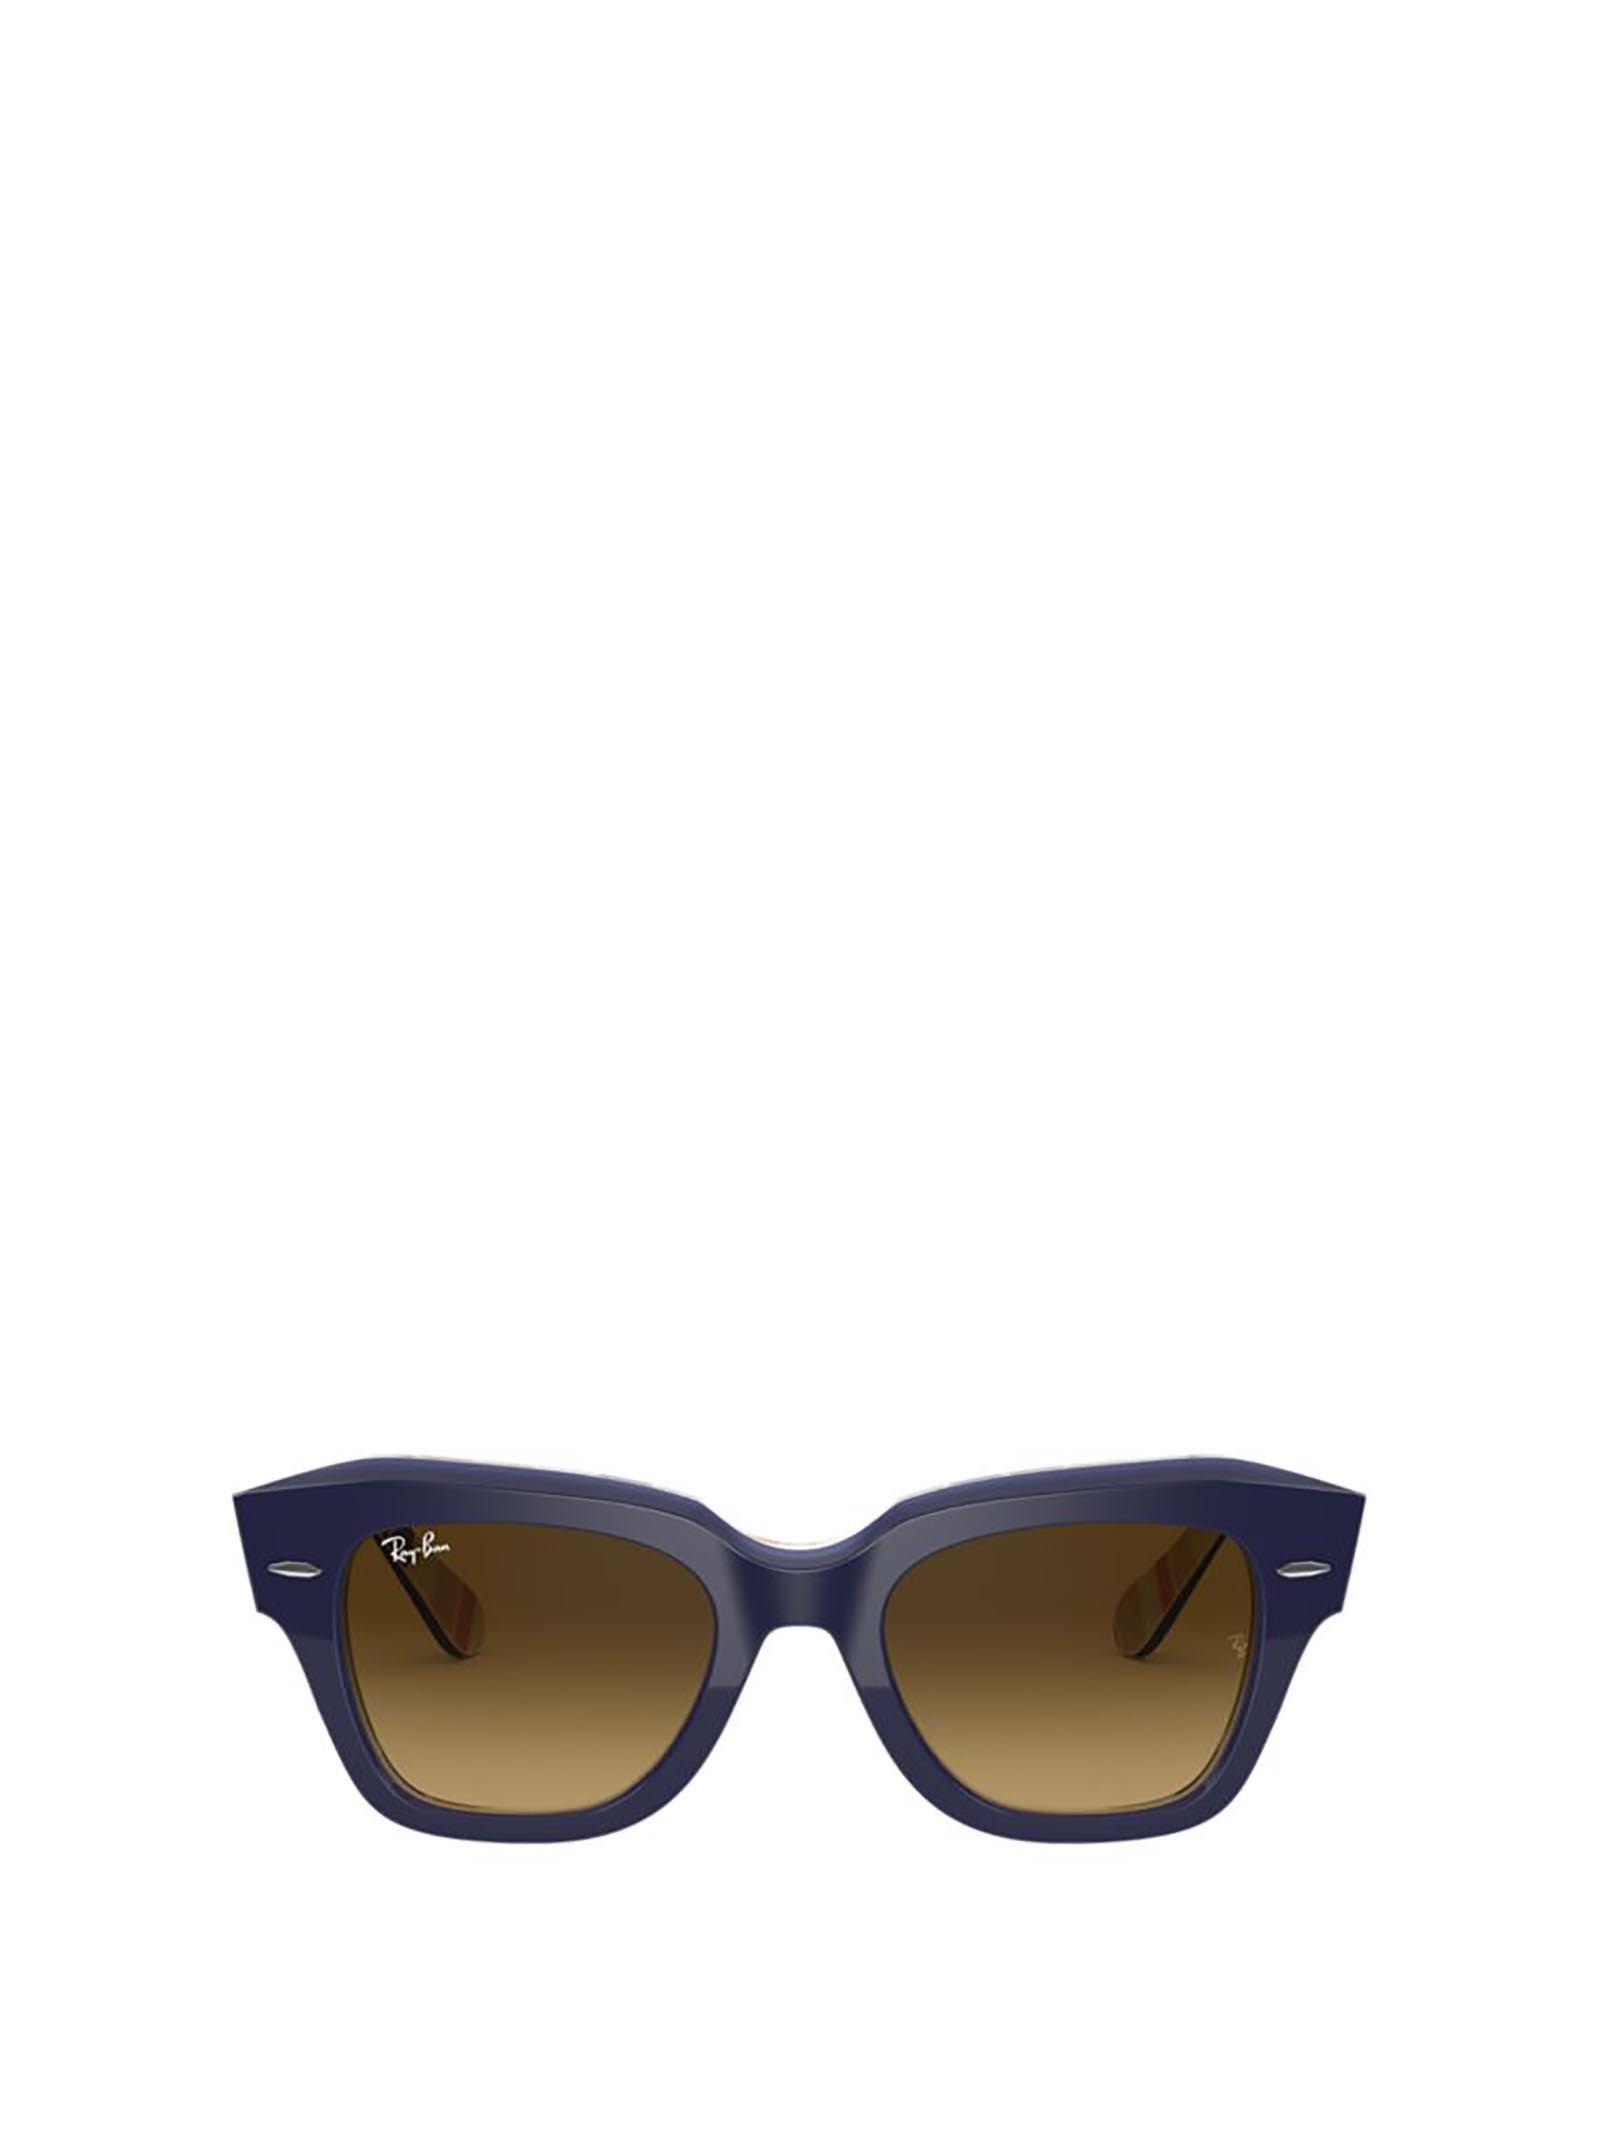 Ray-Ban Ray-ban Rb2186 Blue On Stripes Orange / Blue Sunglasses